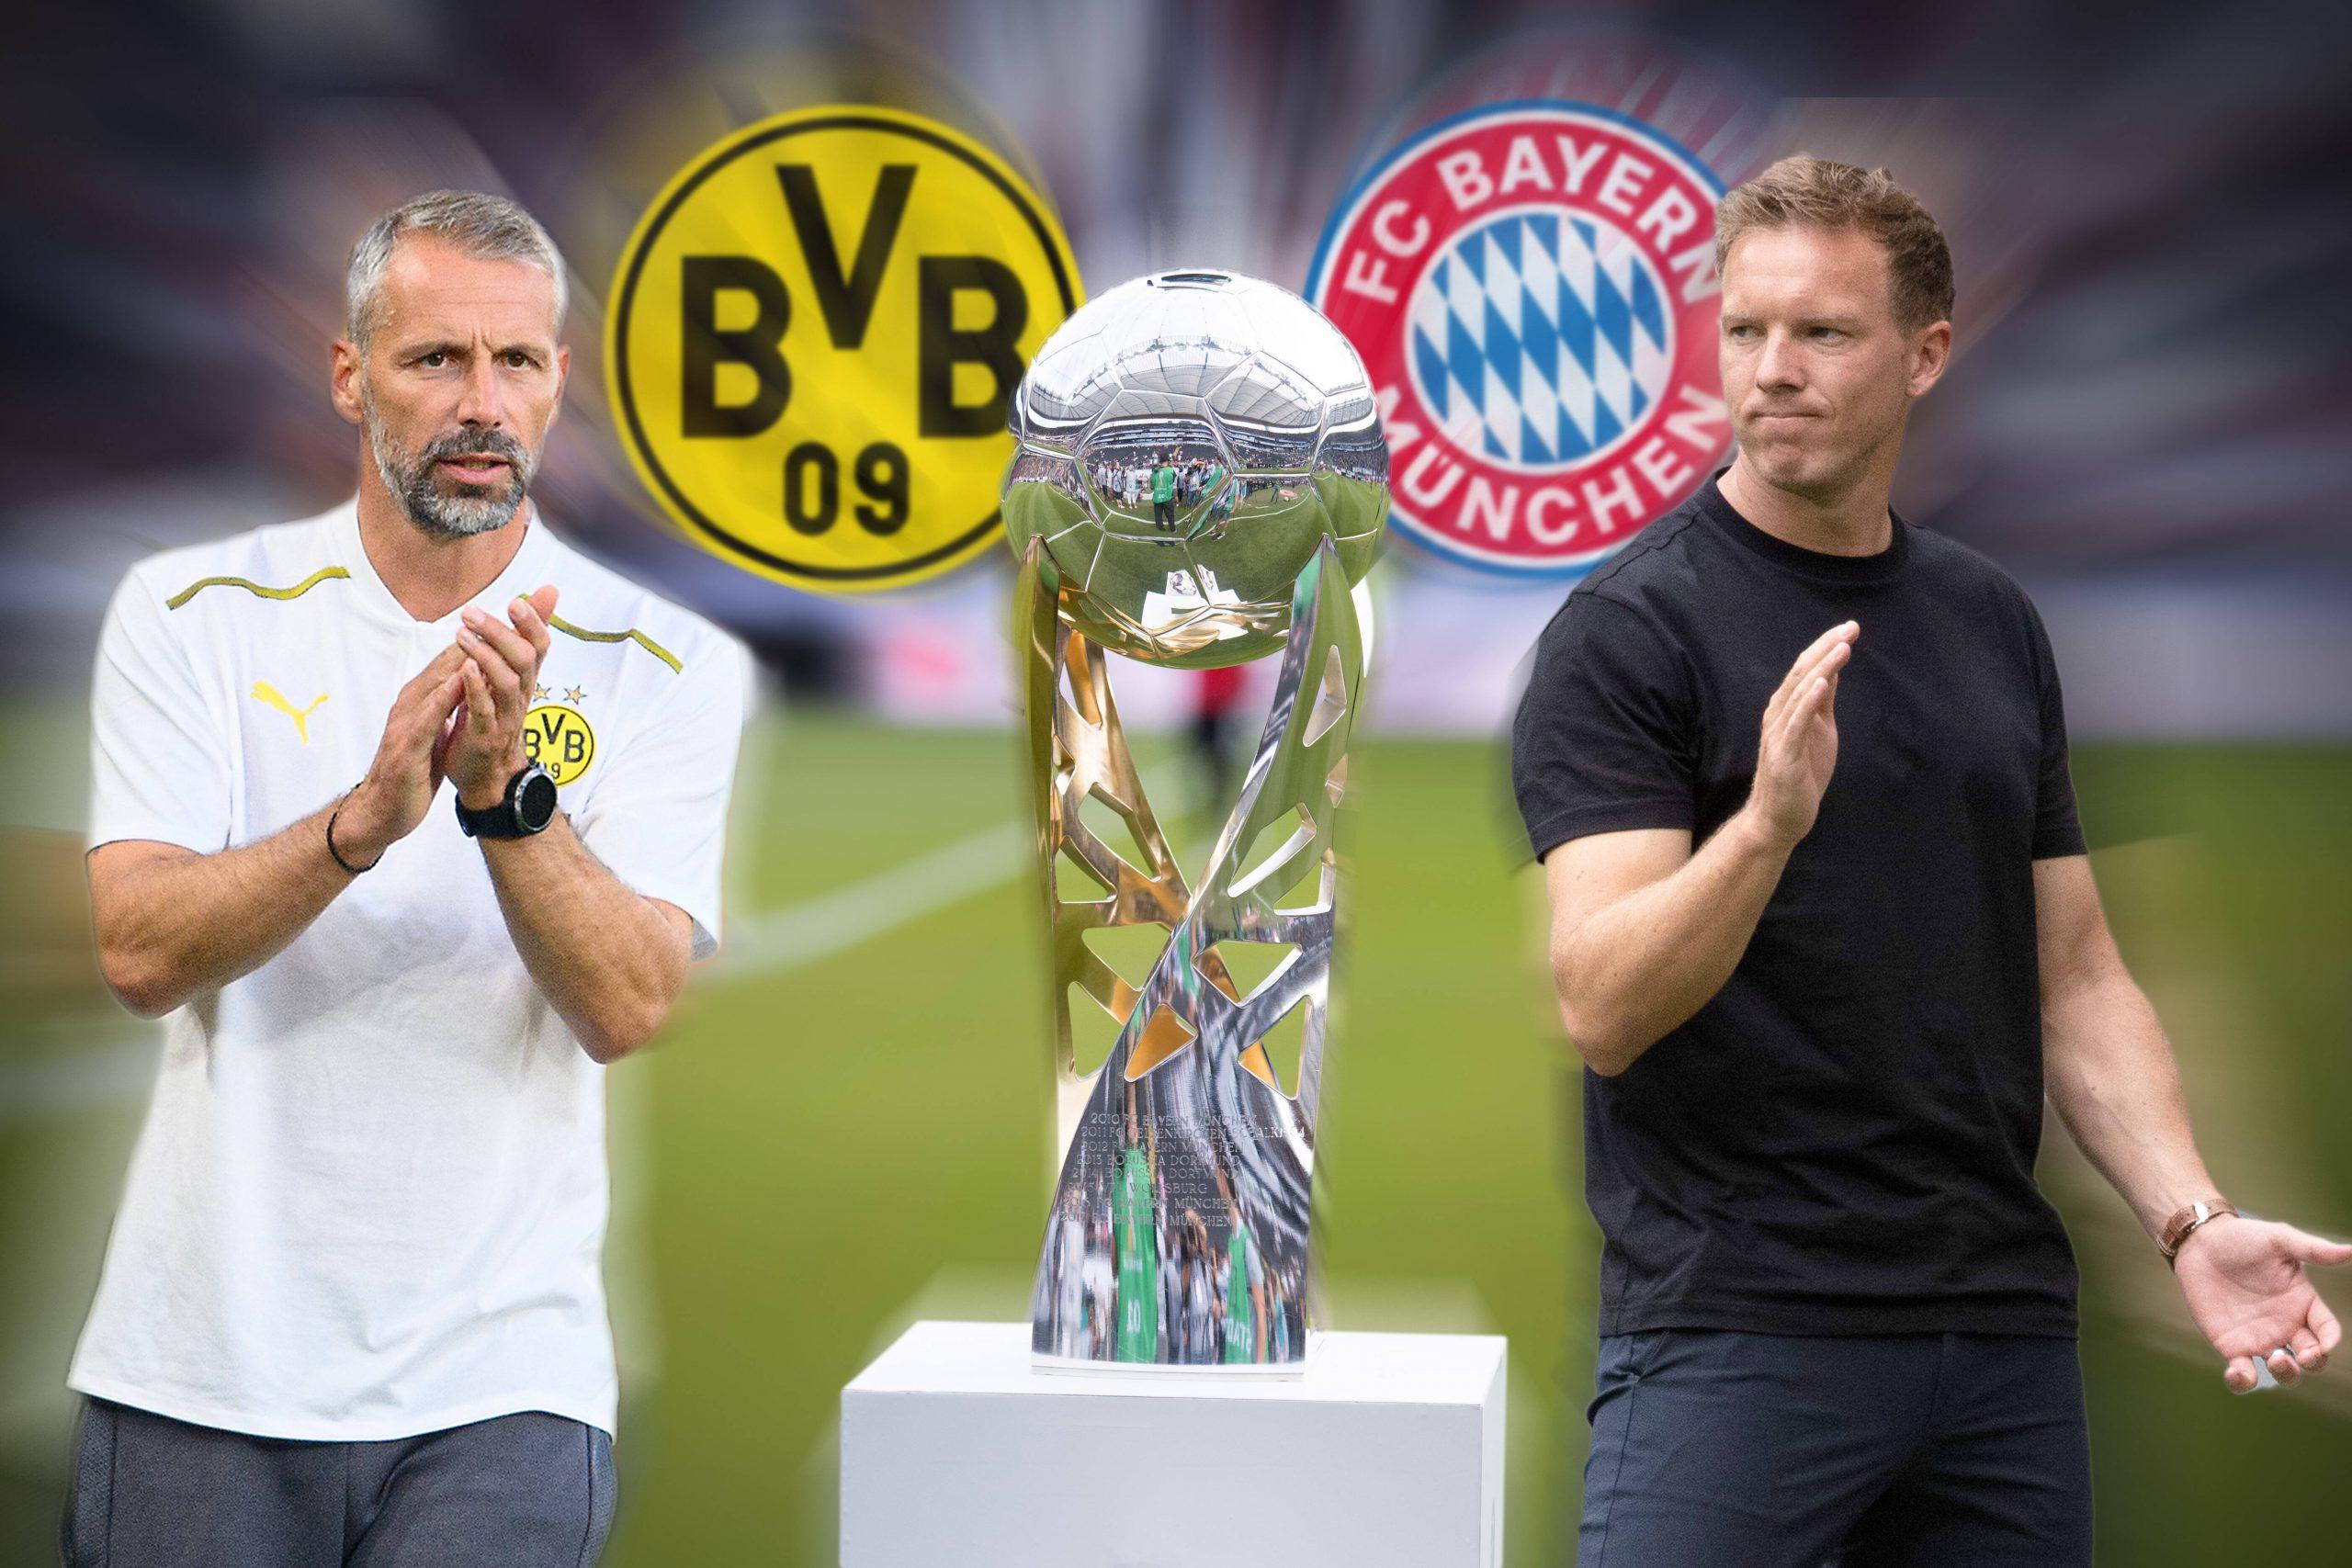 Dortmund-Bayern Monaco, il duello: Haaland vs Upamecano